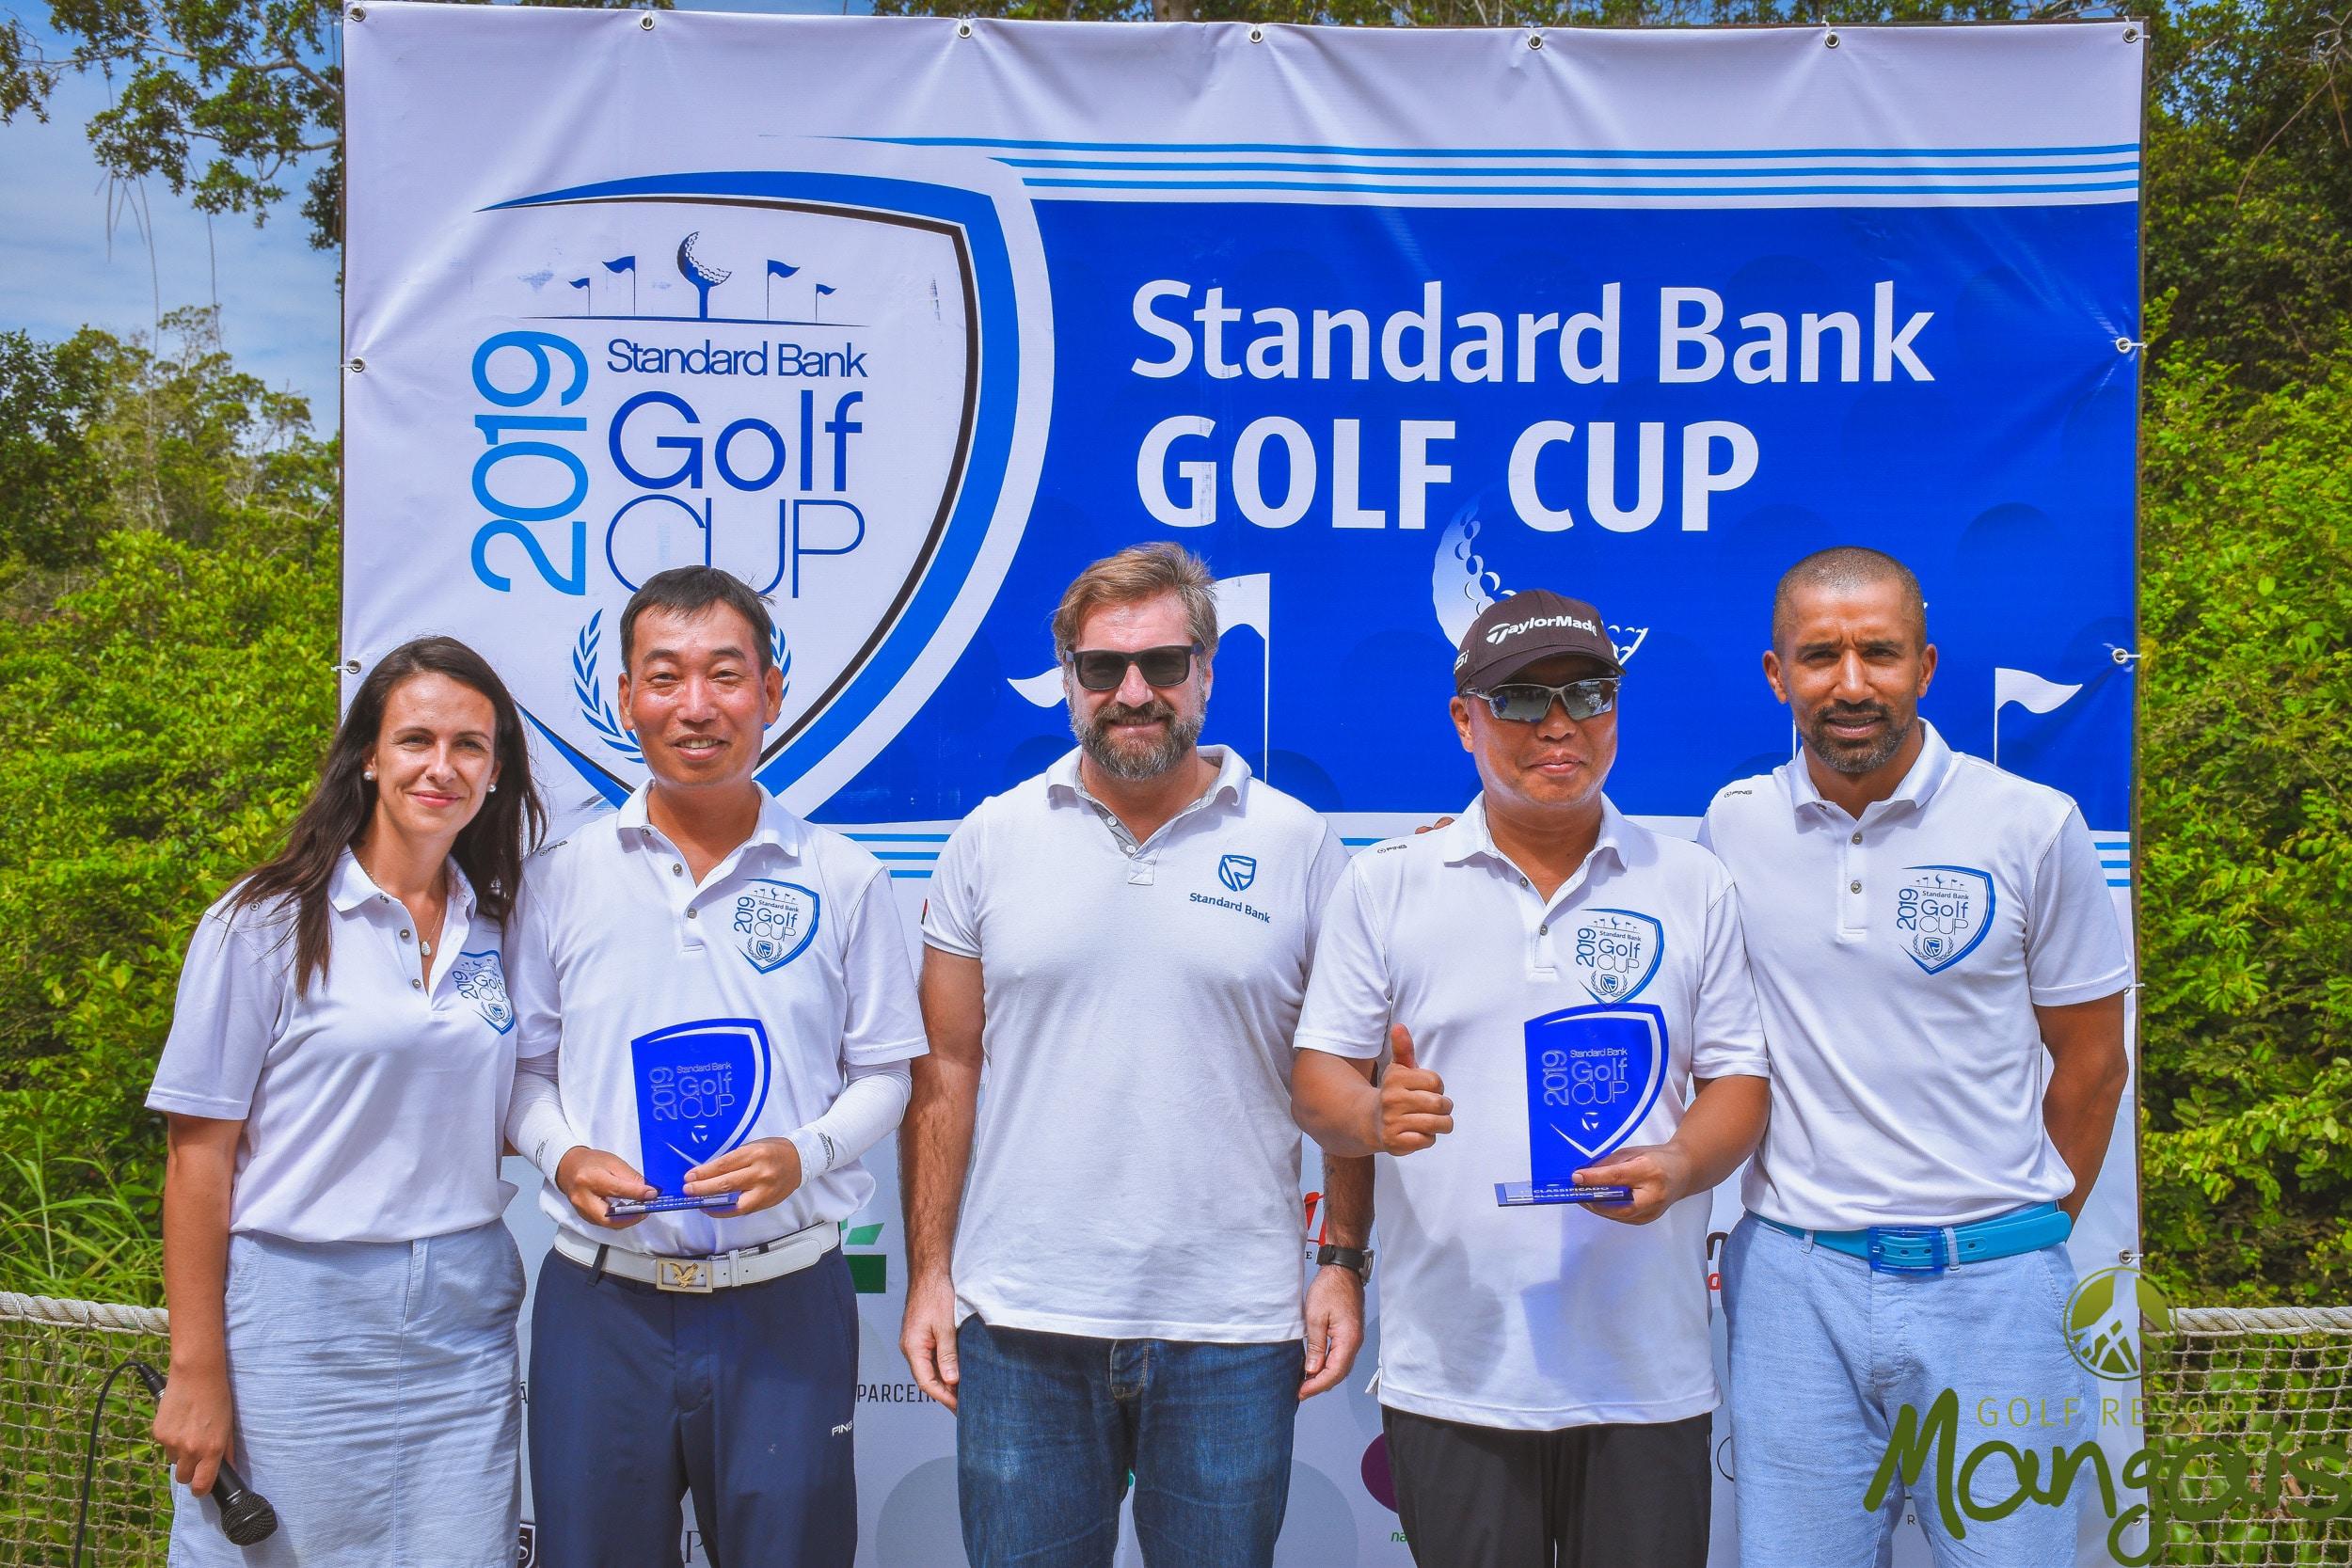 mangais golf & resort acolheu 1.ª etapa do campeonato standard bank golf cup 2019 - SBC 16022019 1020 - Mangais Golf & Resort acolheu 1.ª etapa do Campeonato Standard Bank Golf Cup 2019